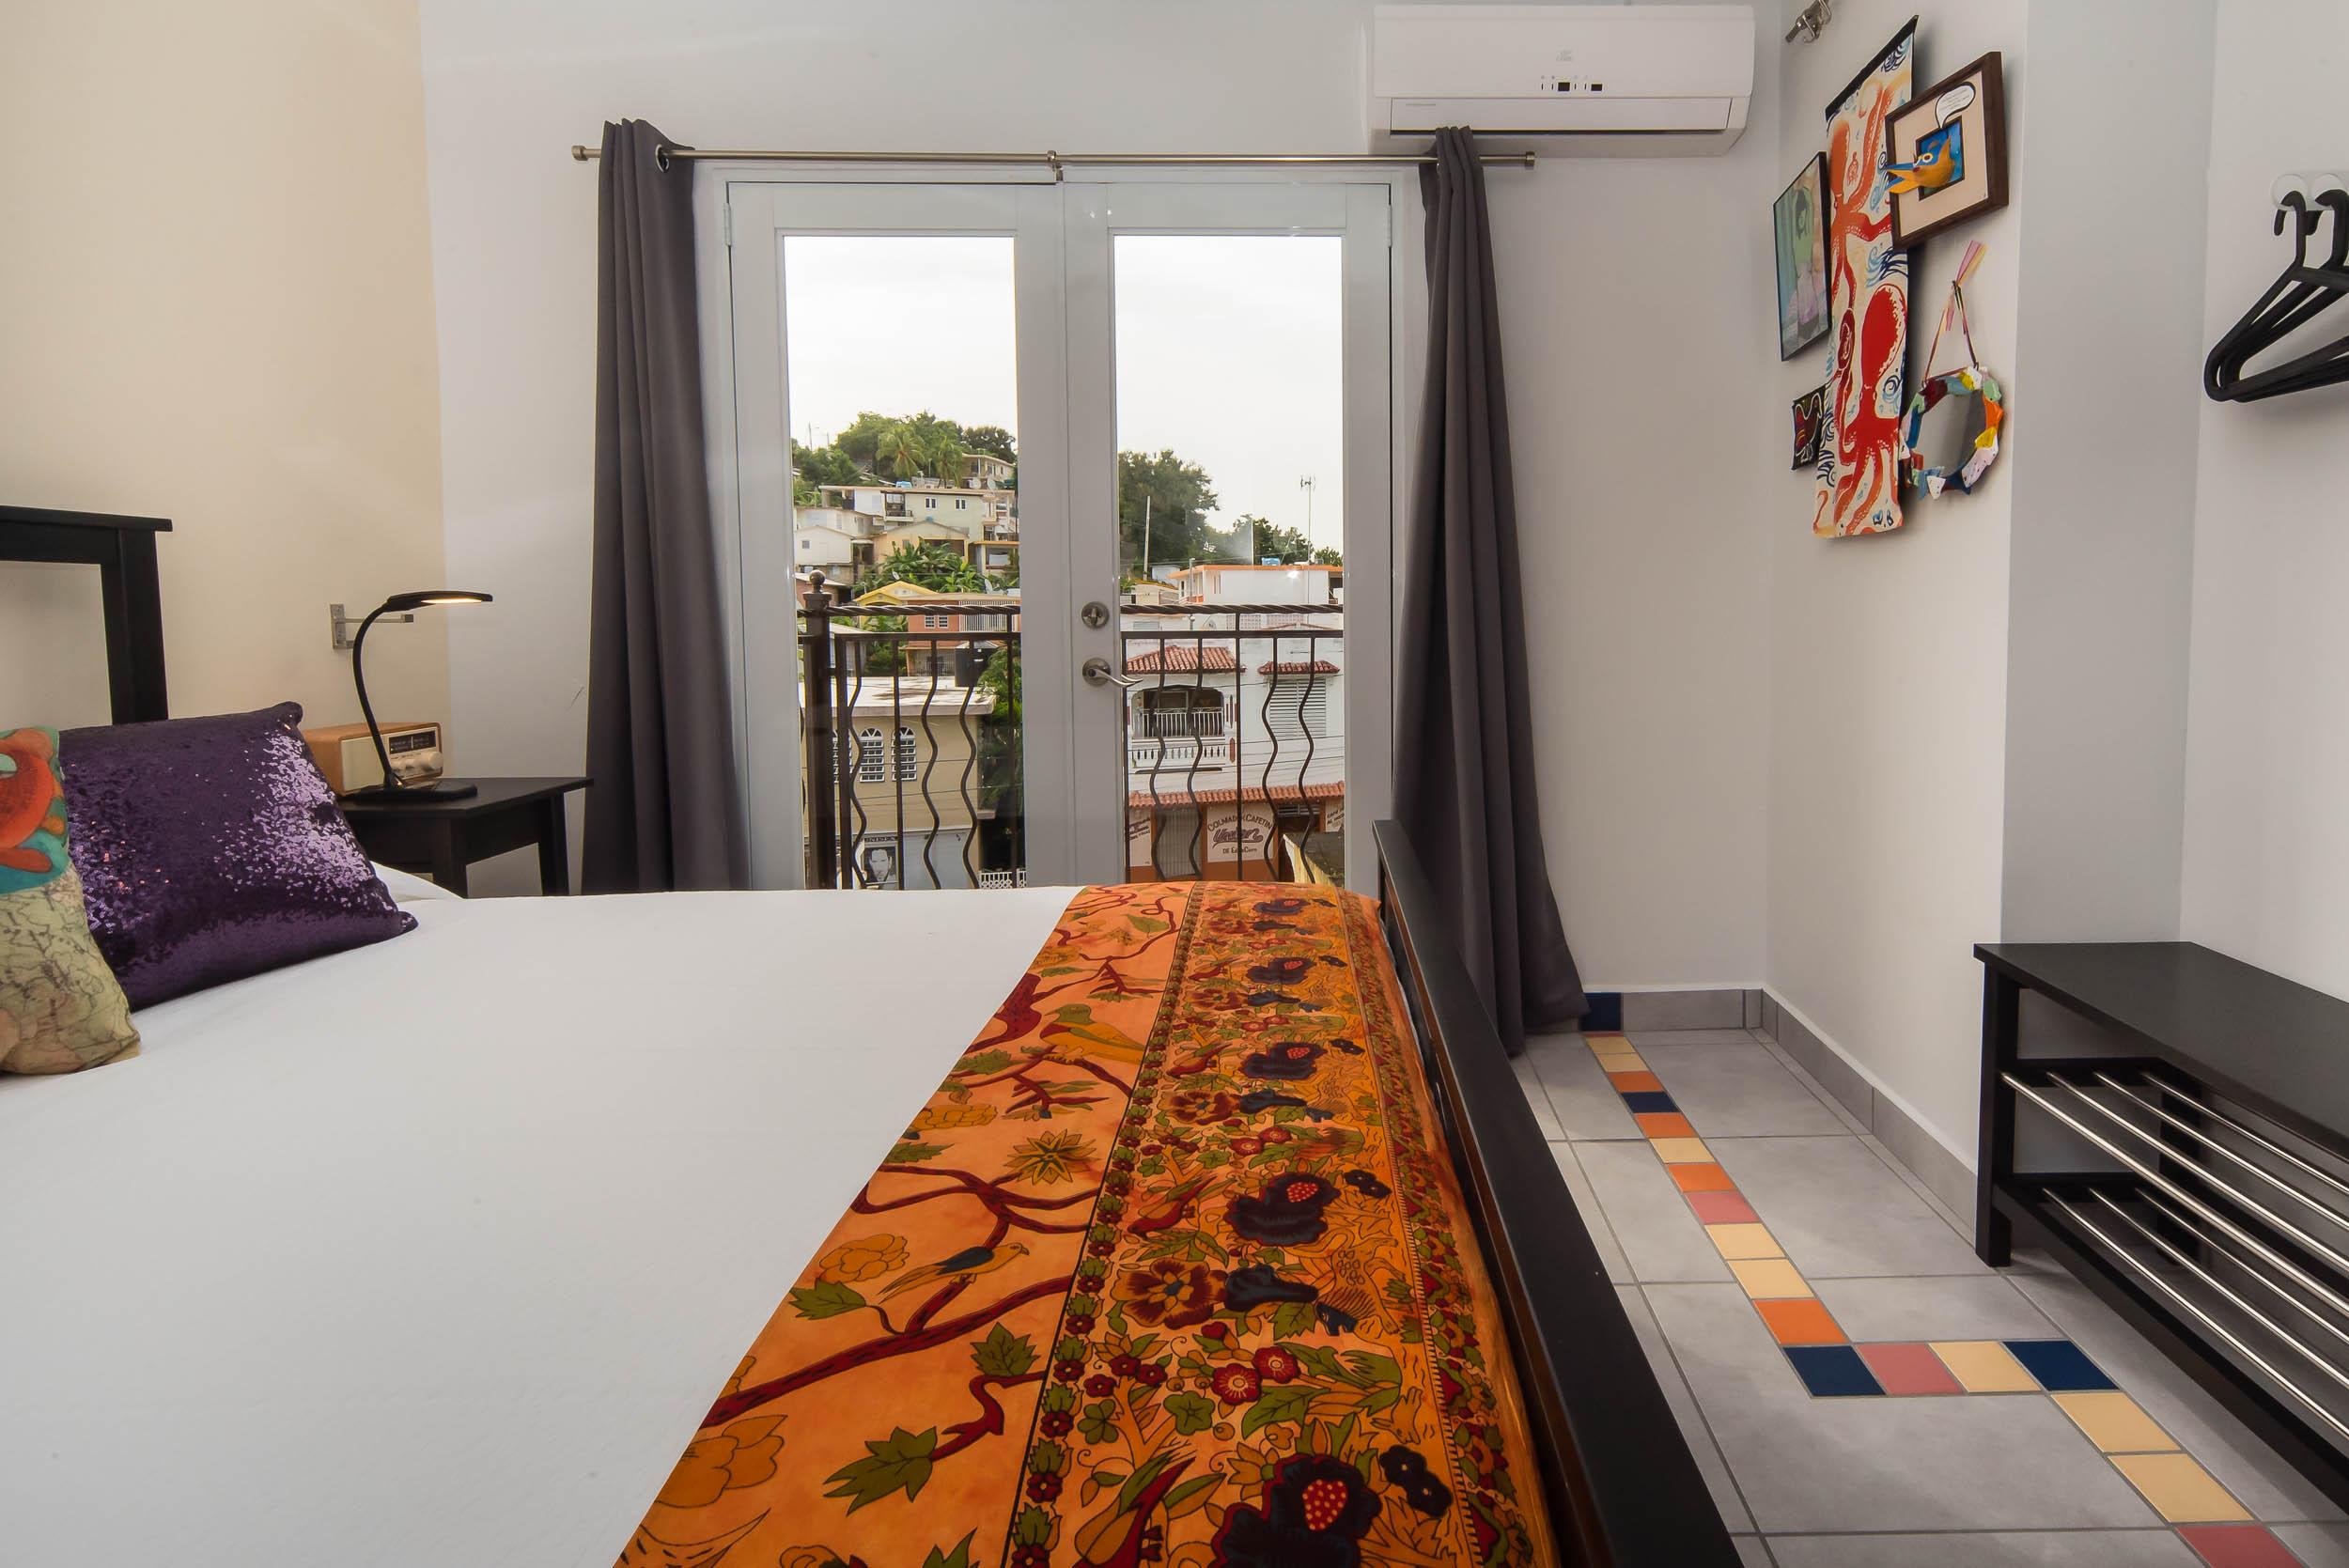 POSADA_room_interiors_FLOOR_3_301-9.jpg